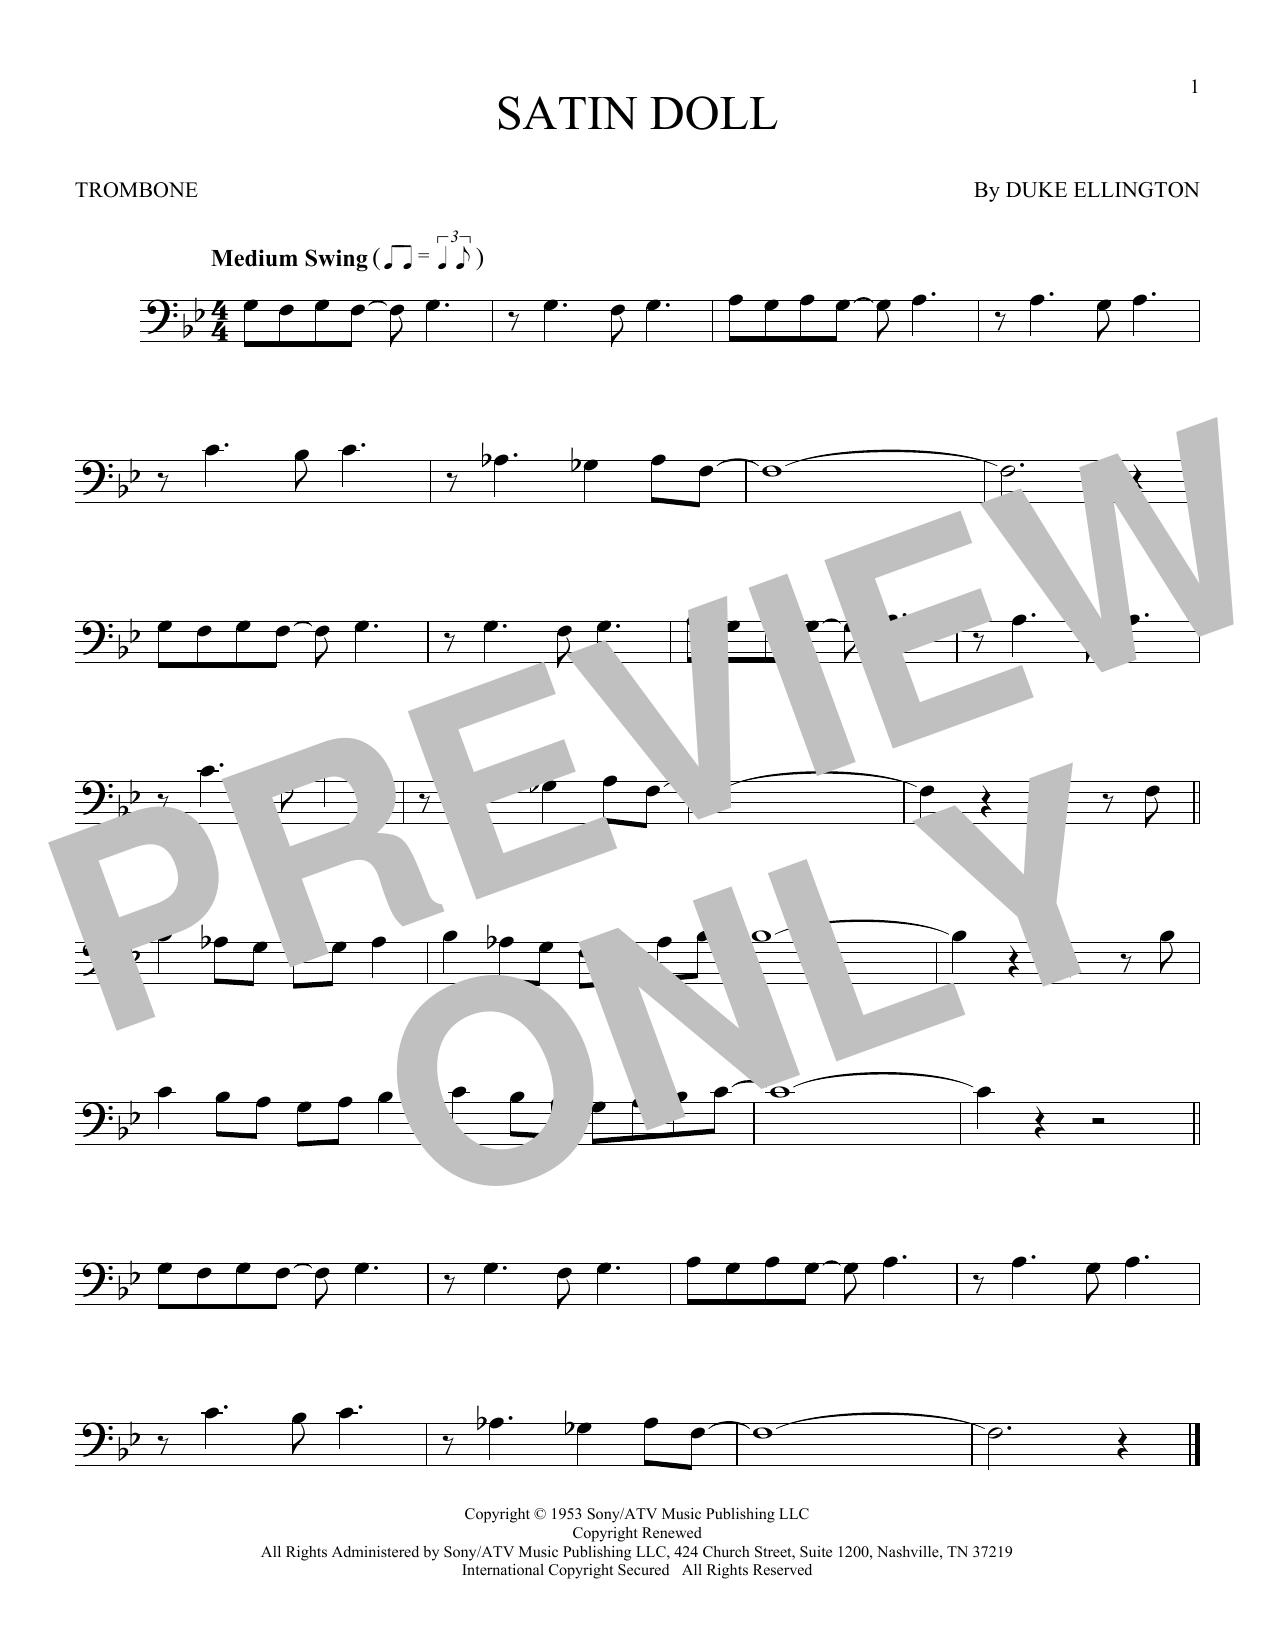 Duke Ellington 'Satin Doll' Sheet Music Notes, Chords | Download Printable  Trombone Solo - SKU: 168666